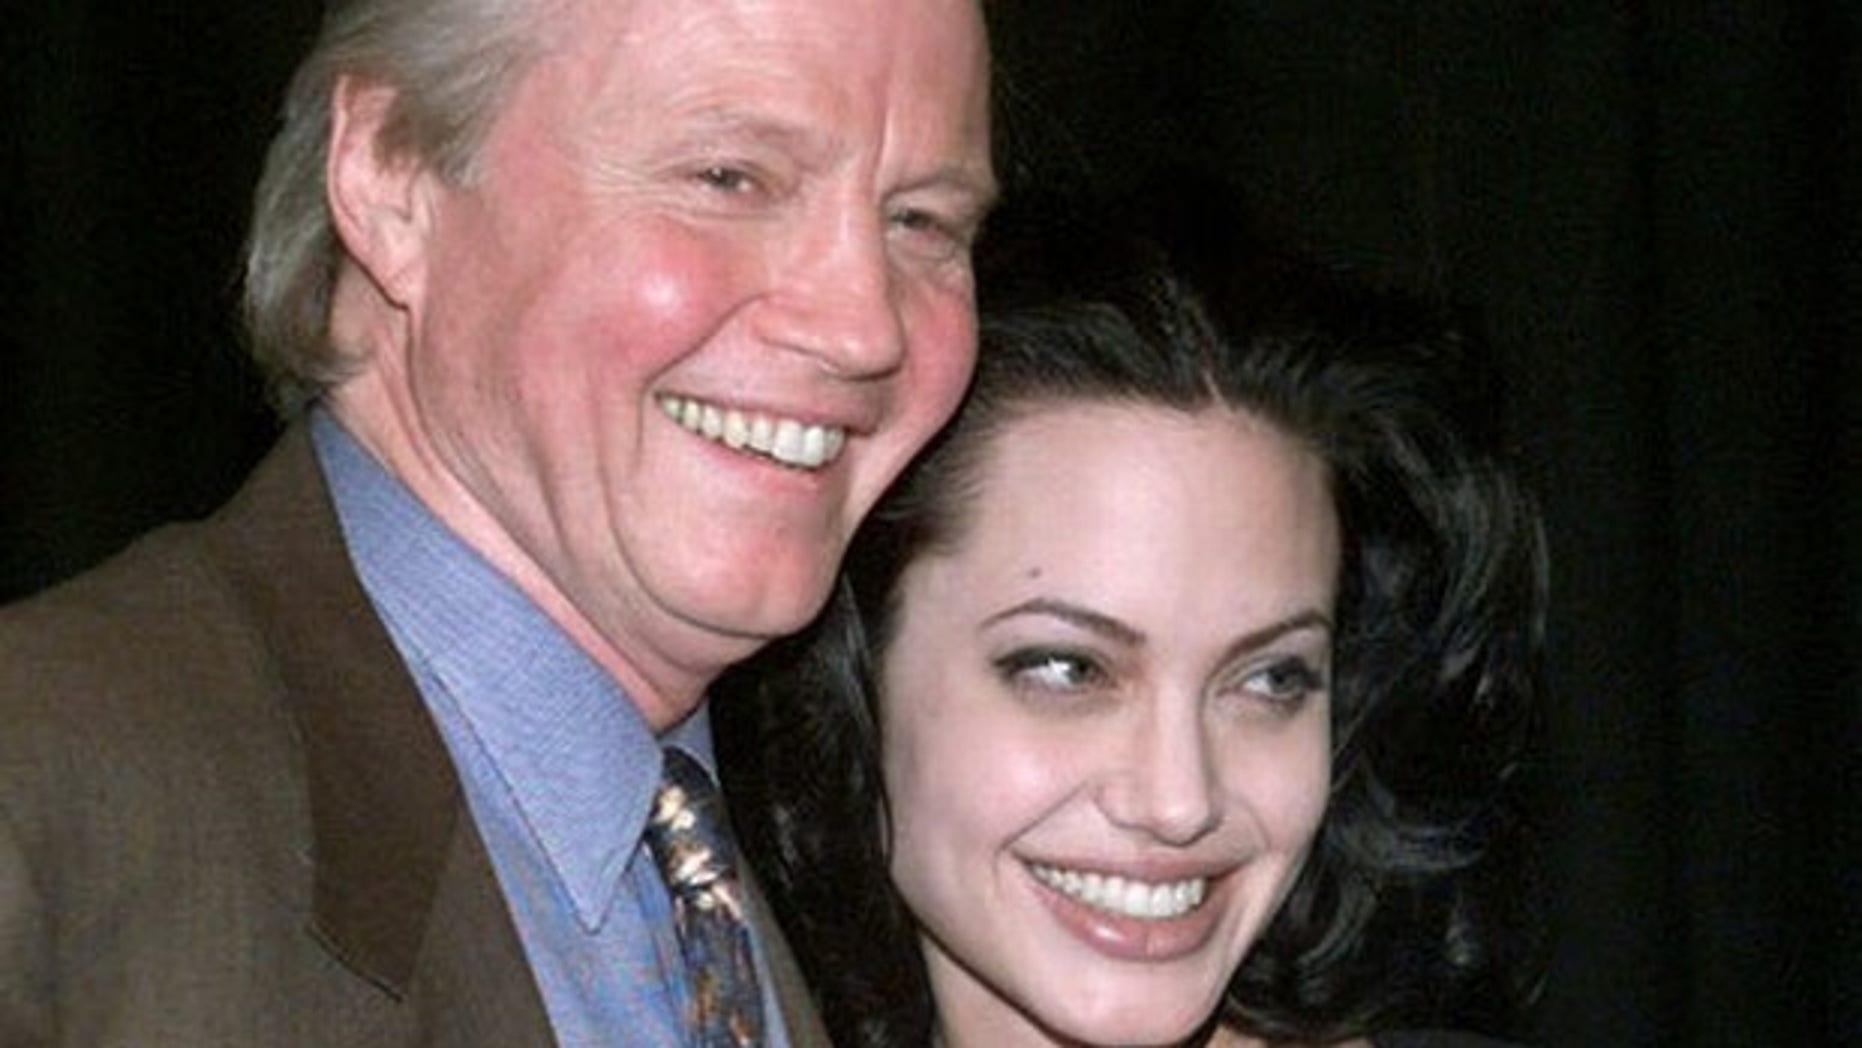 Jon Voight and daughter Angelina Jolie in 2000.